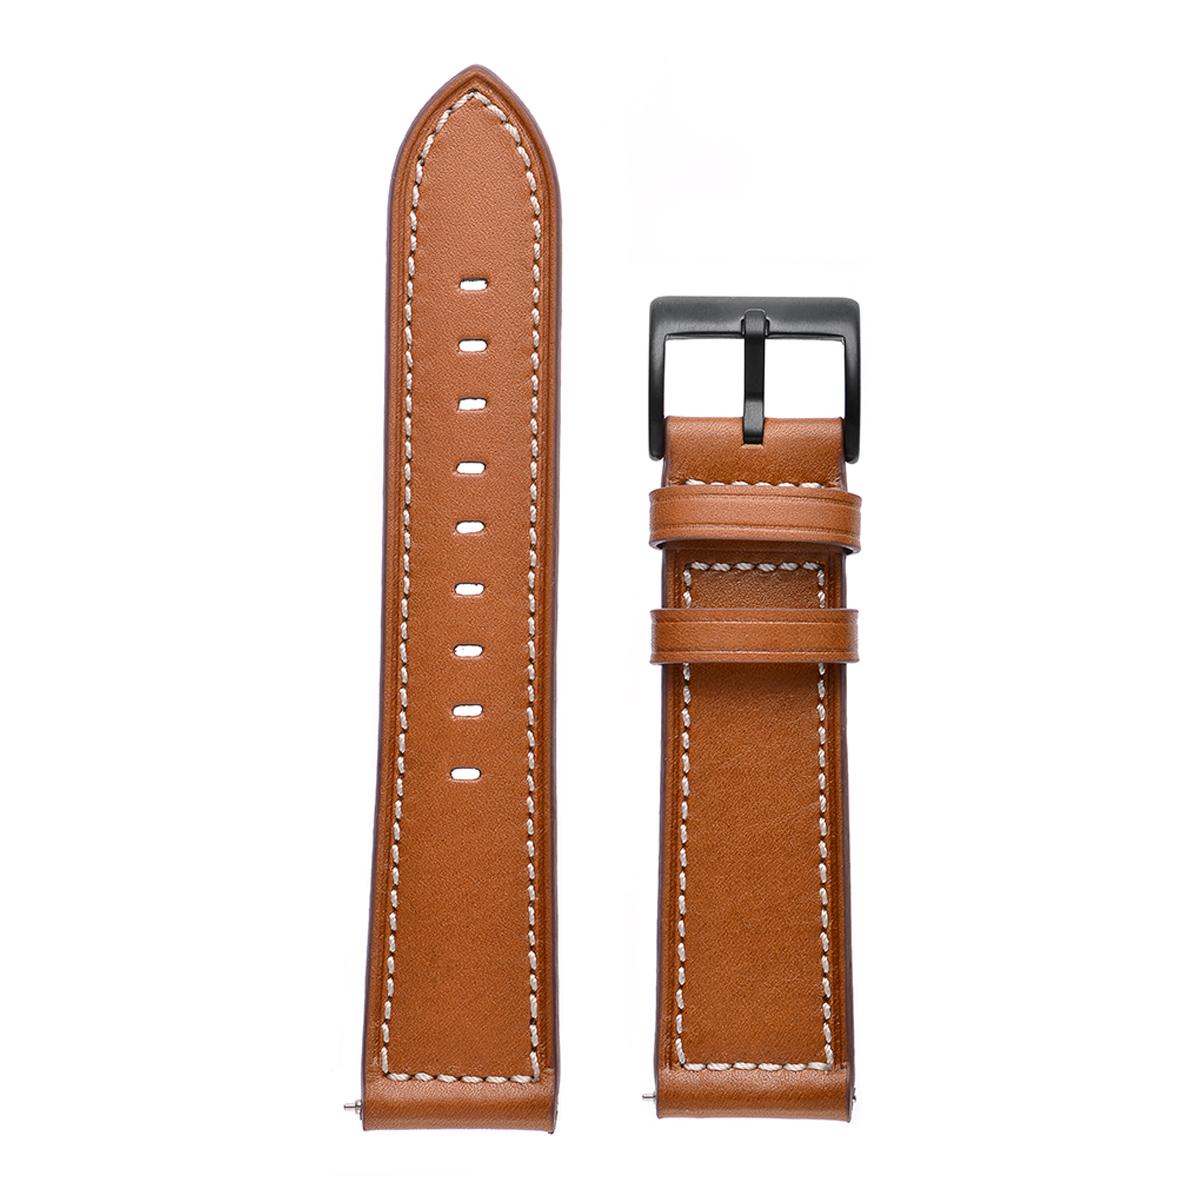 Genuine Leather Watch Band Strap For Samsung Gear Sport S4/Garmin Vivoactive 3